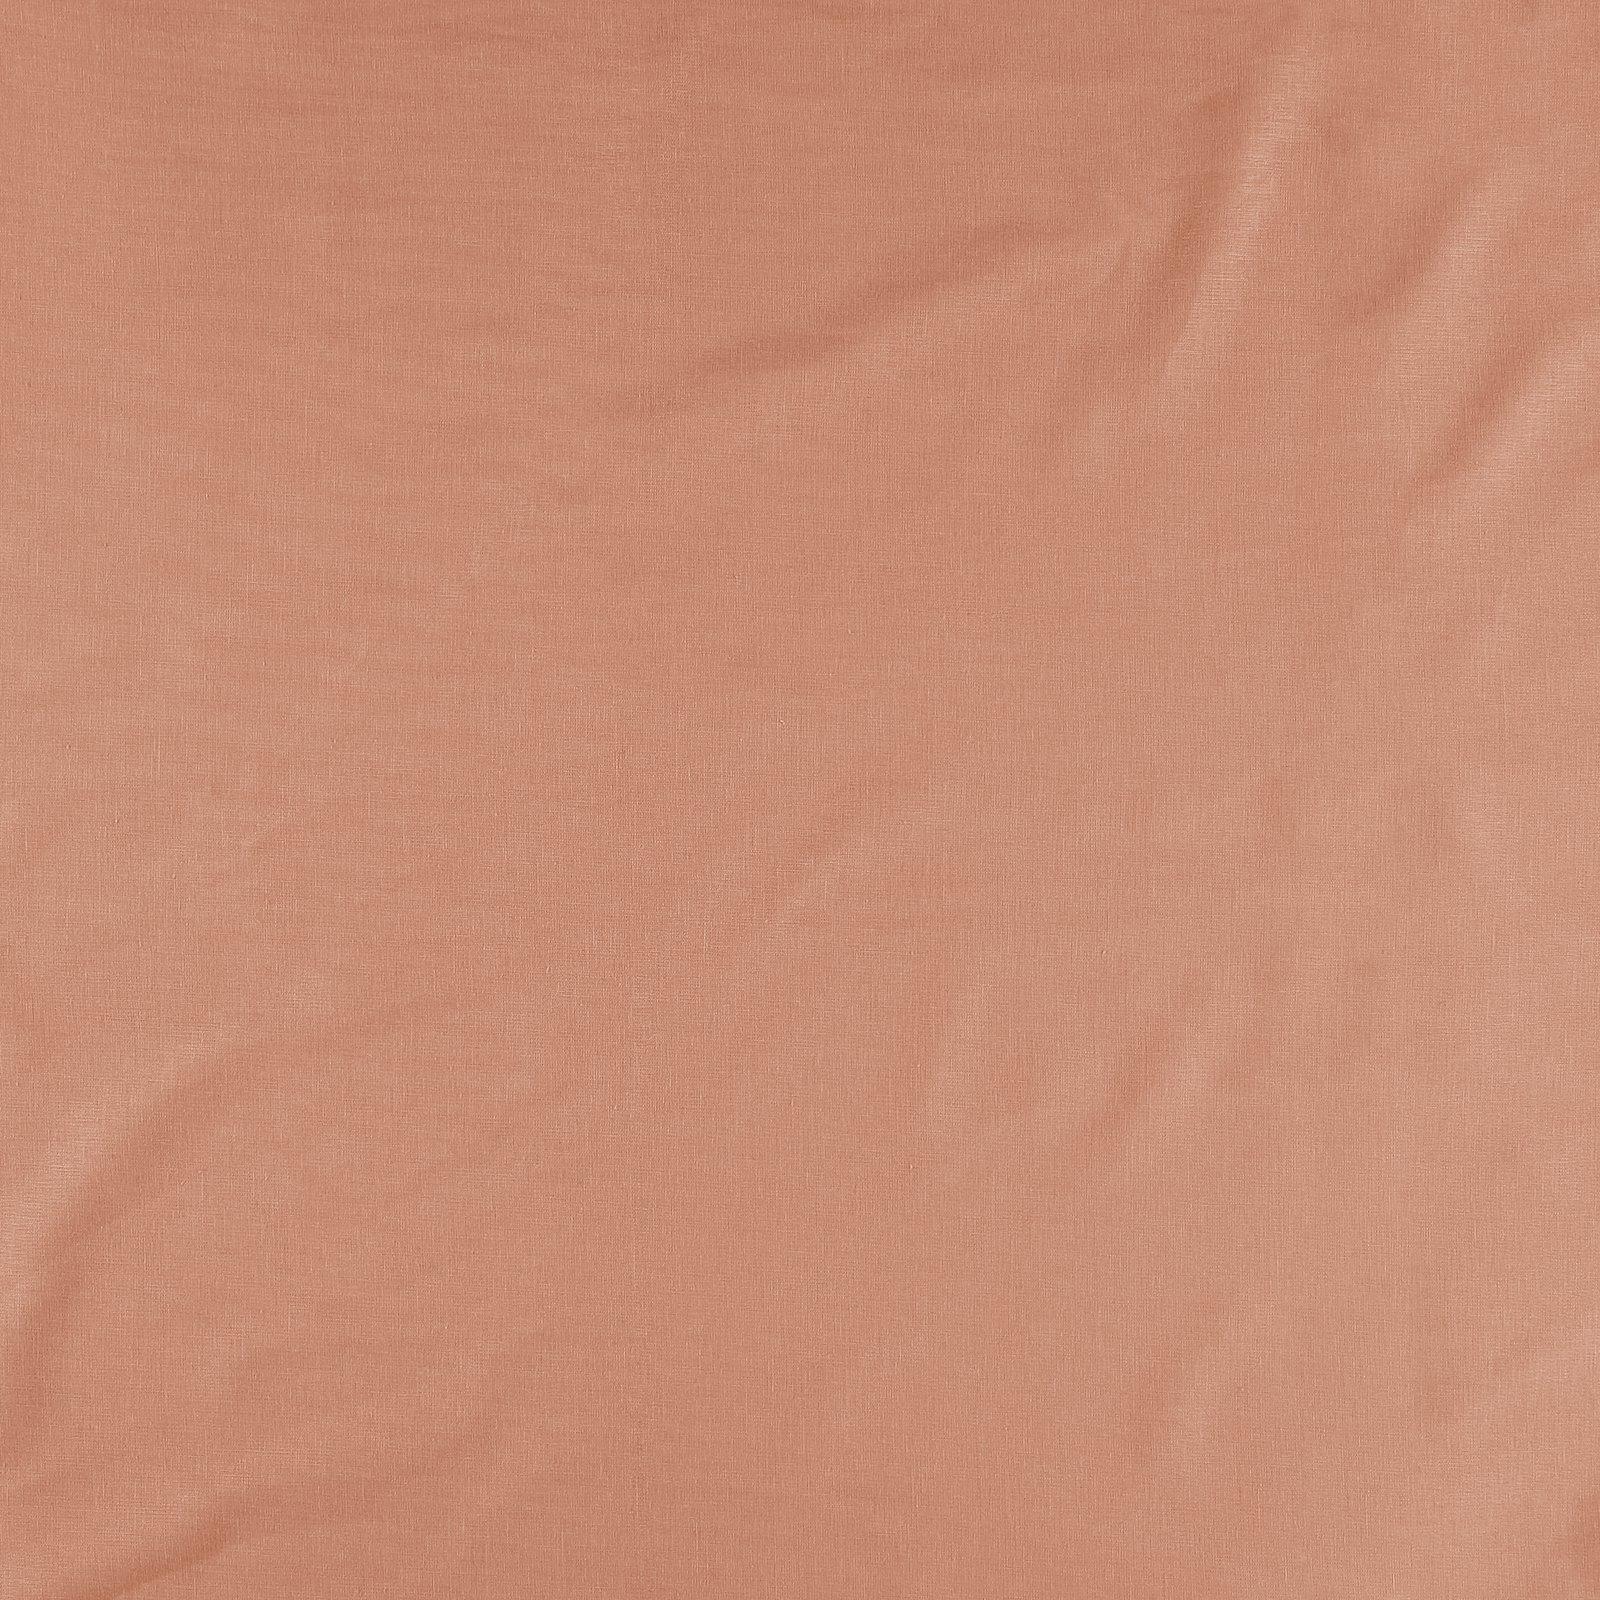 Linen/cotton light terracotta 410132_pack_solid